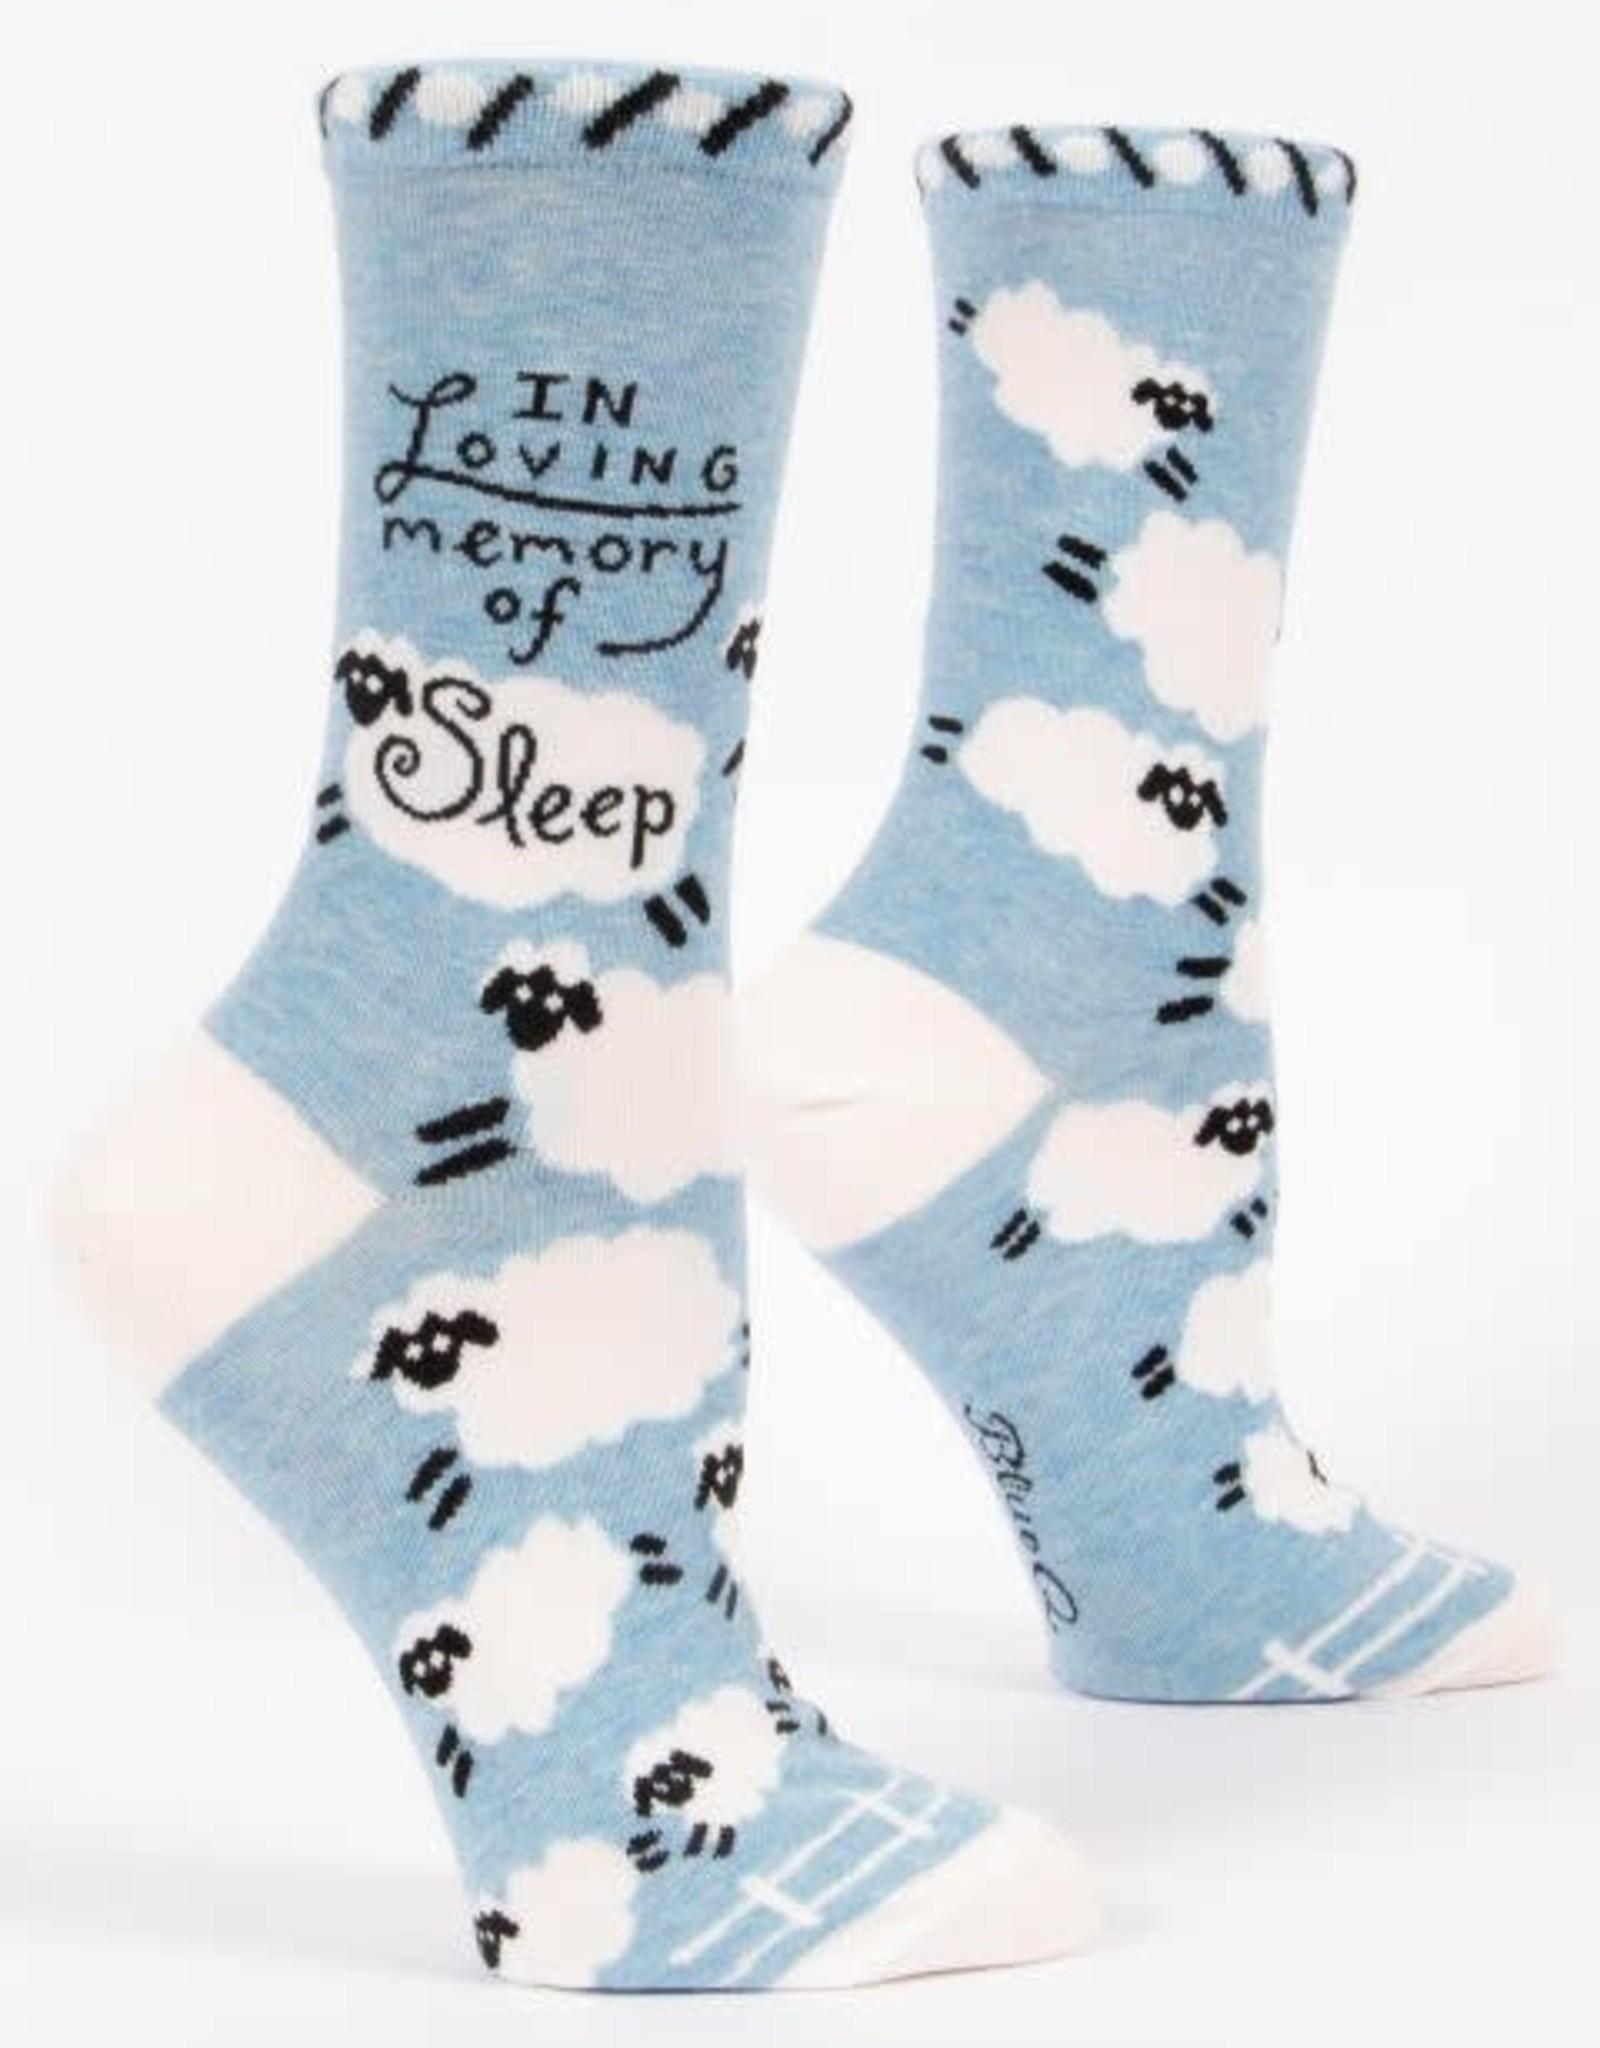 Loving Memory of Sleep Crew Socks